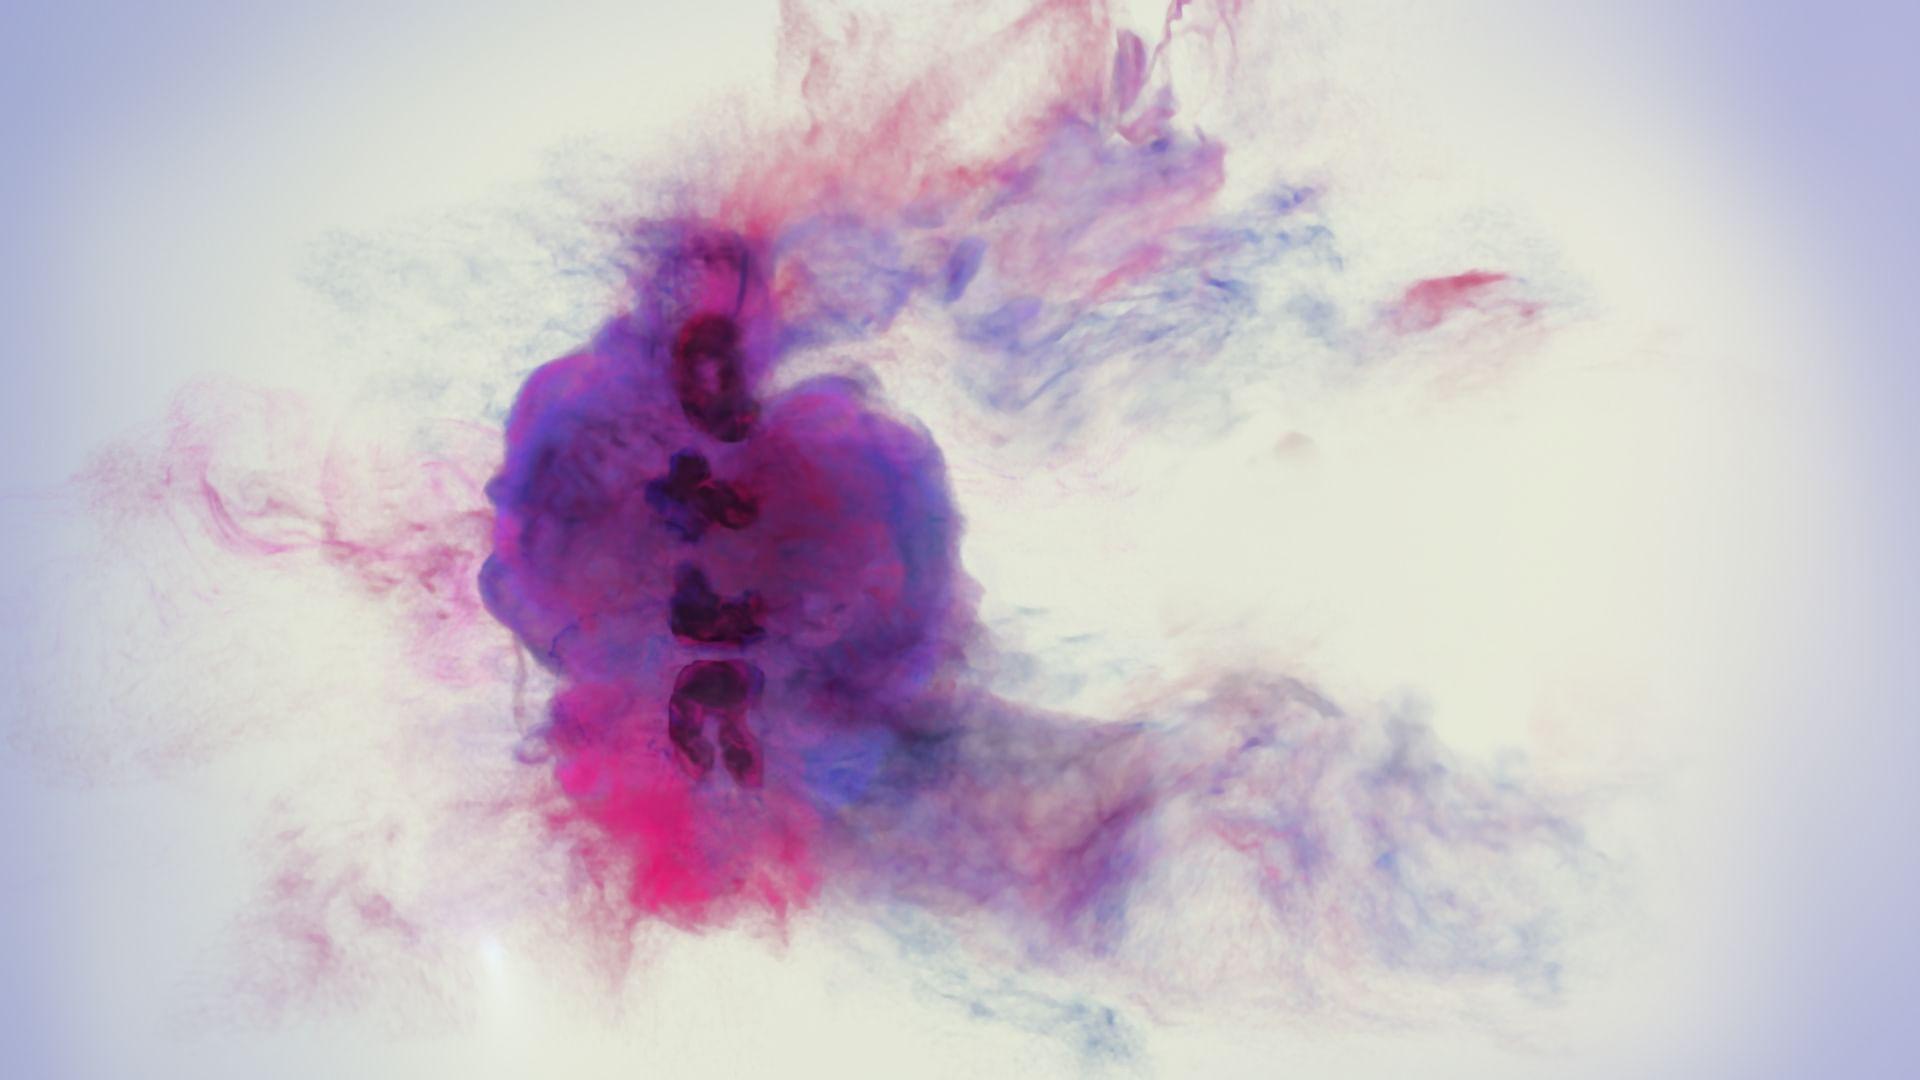 BITS - Kong